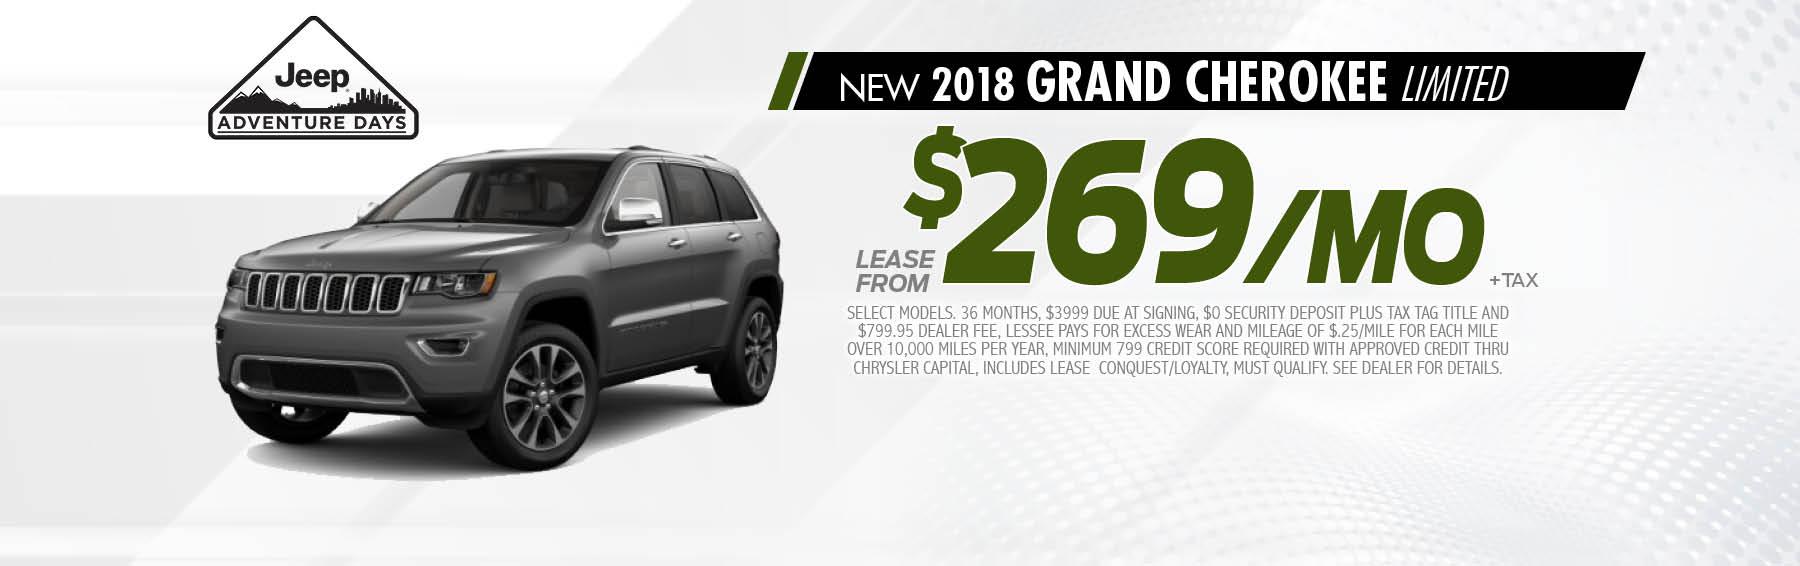 Mazda Dealership Near Me >> Chrysler, Dodge, Jeep, RAM Trucks New and Used near me Car Dealership West Palm Beach, FL Arrigo ...